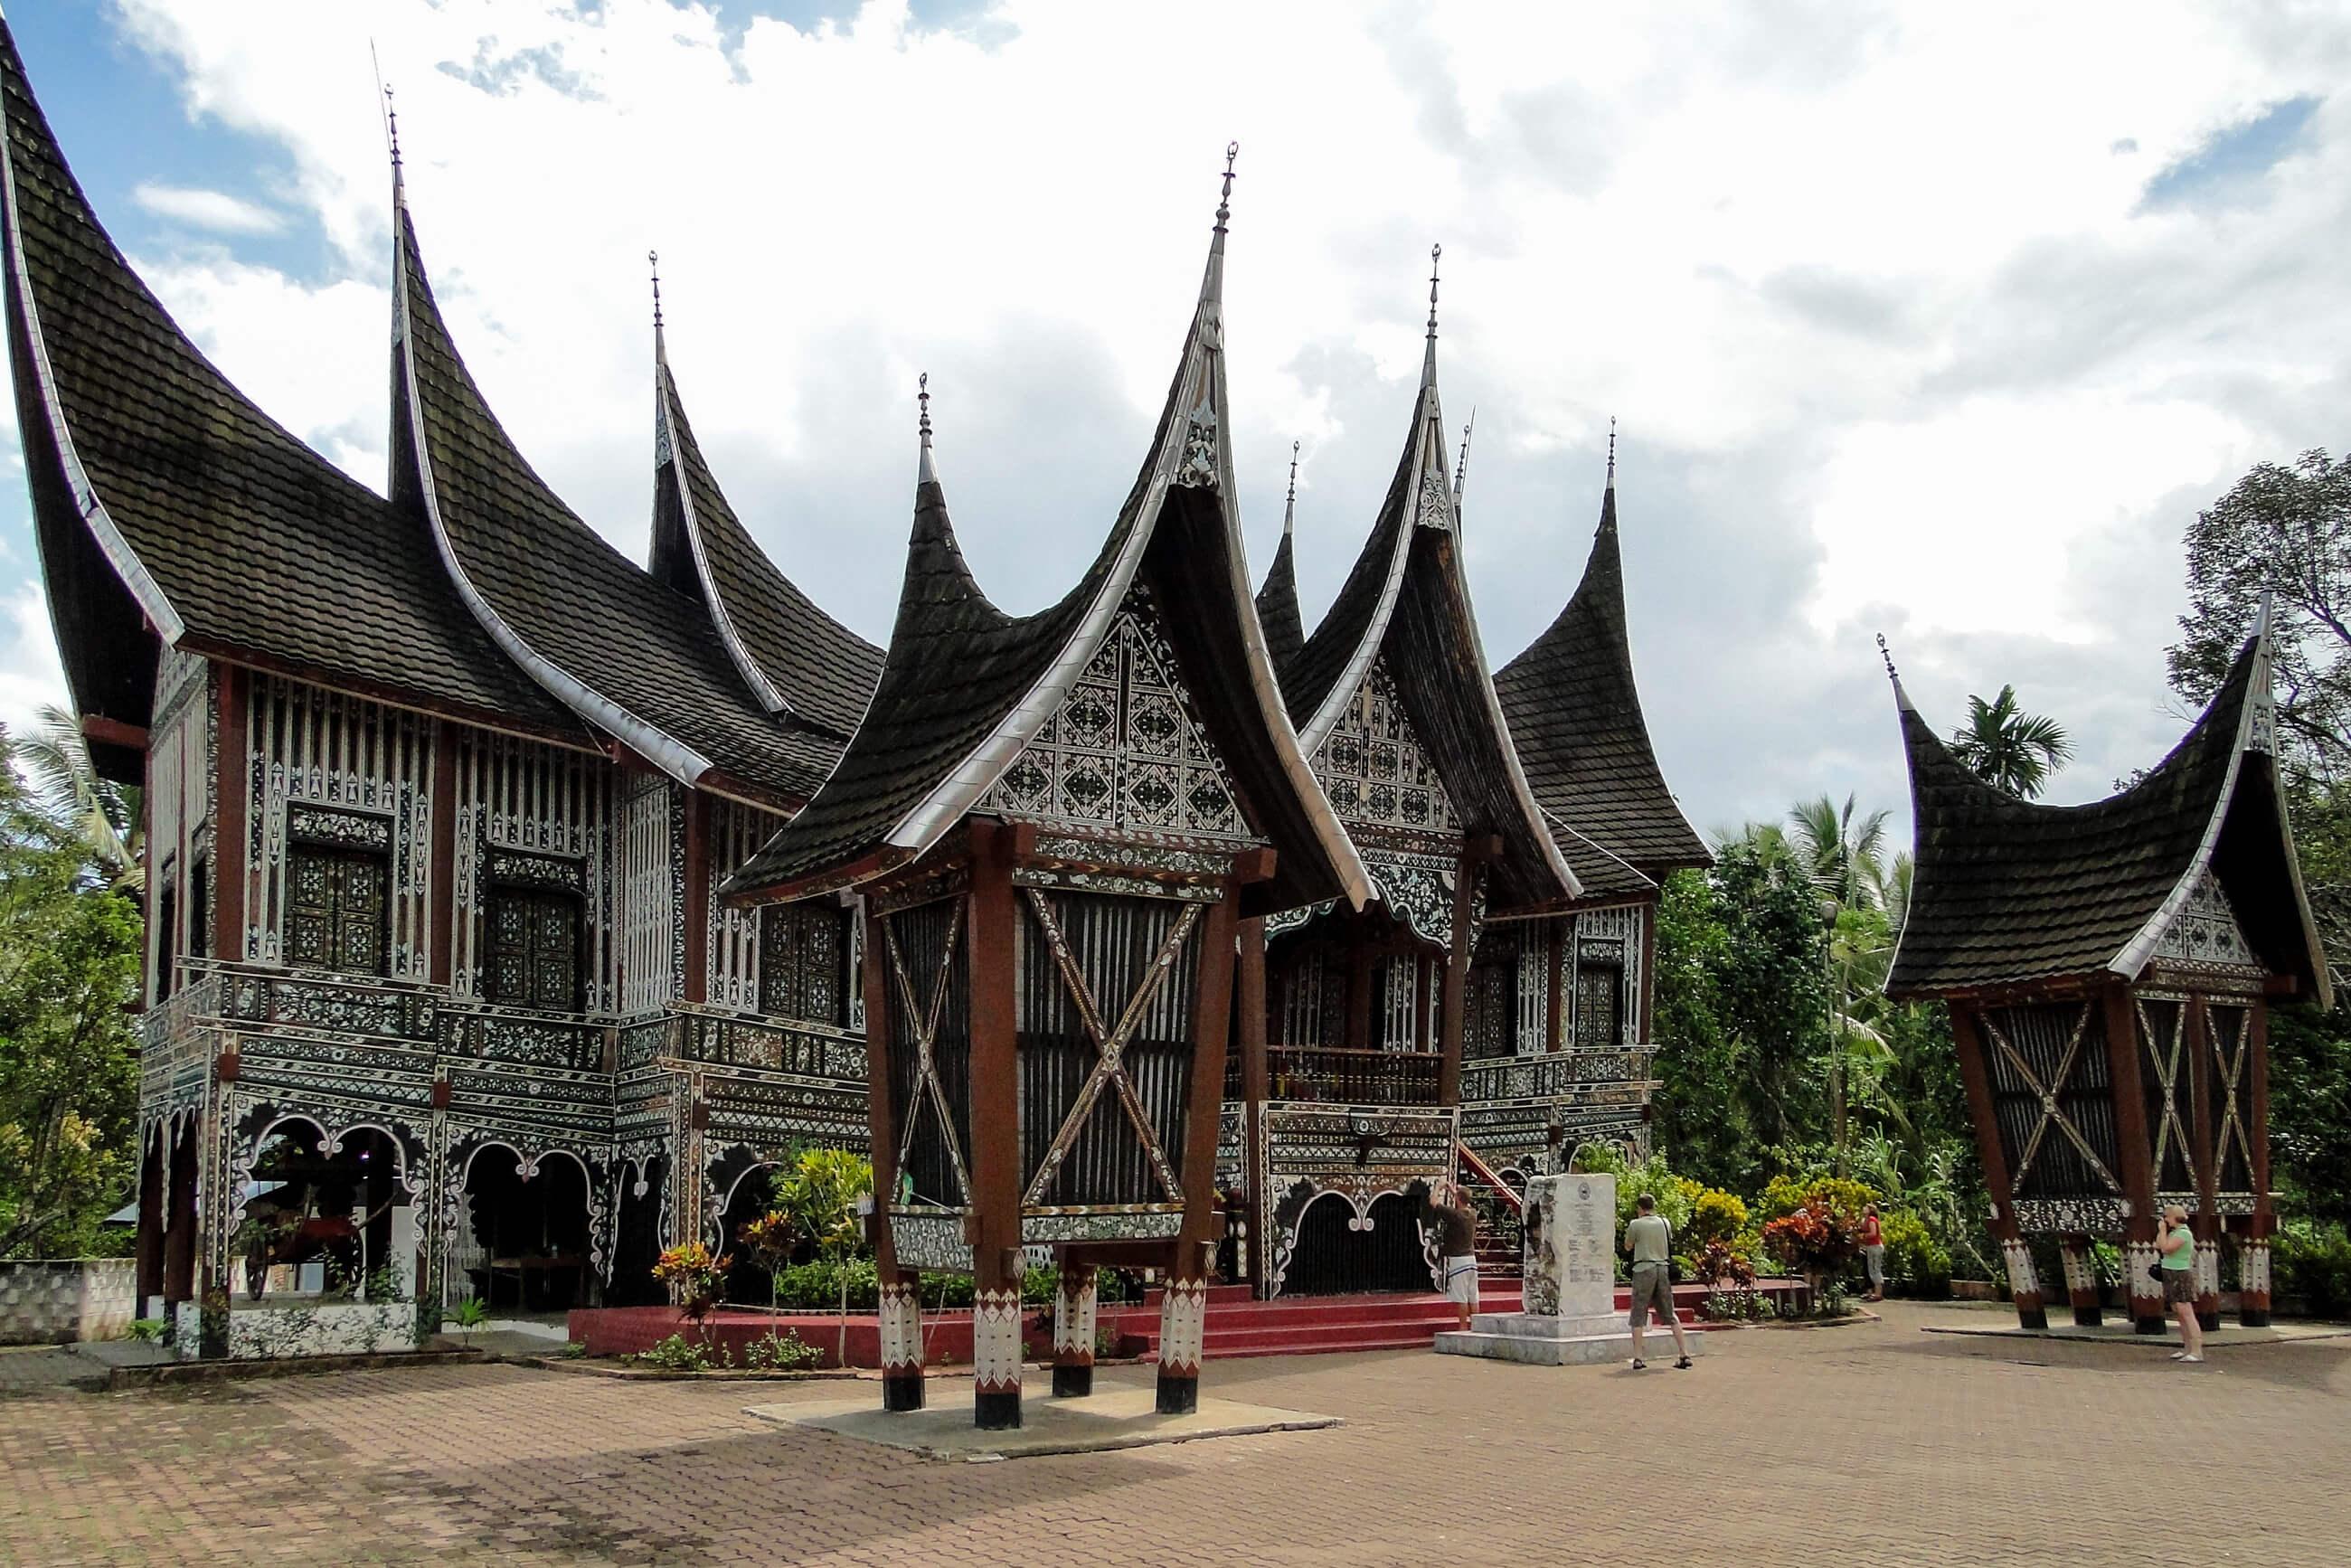 https://bubo.sk/uploads/galleries/7396/archiv_indonezia_sumatra_dsc02110-7.jpg